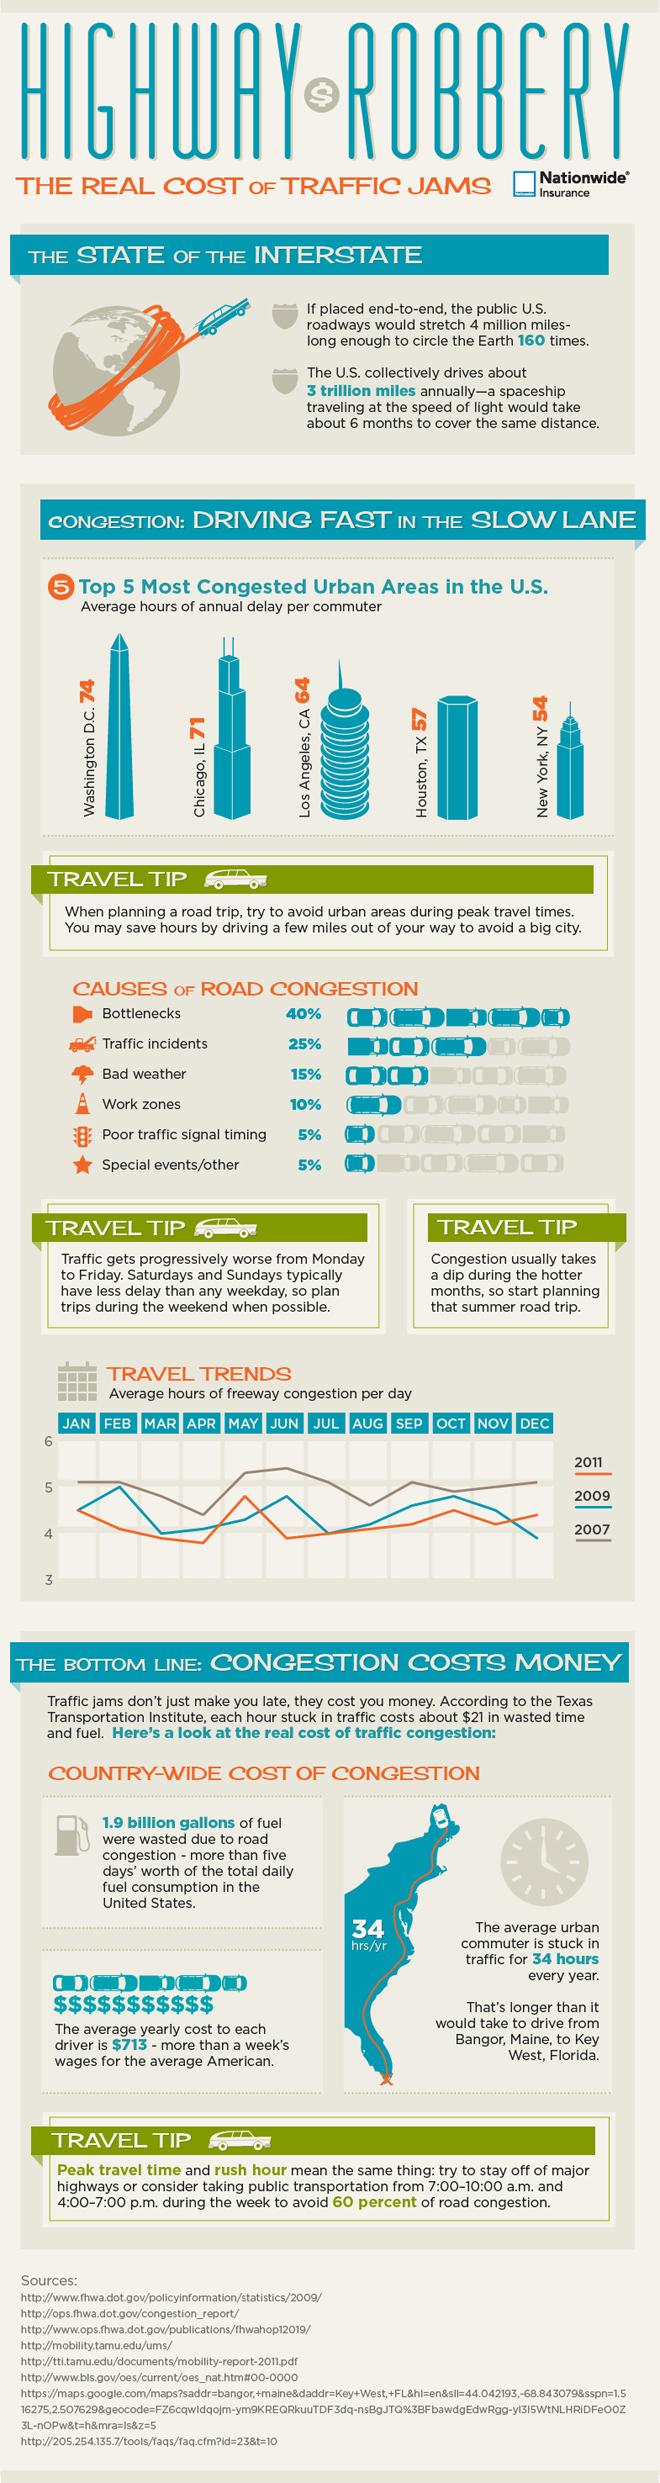 Traffic Jams and Commuting Statistics